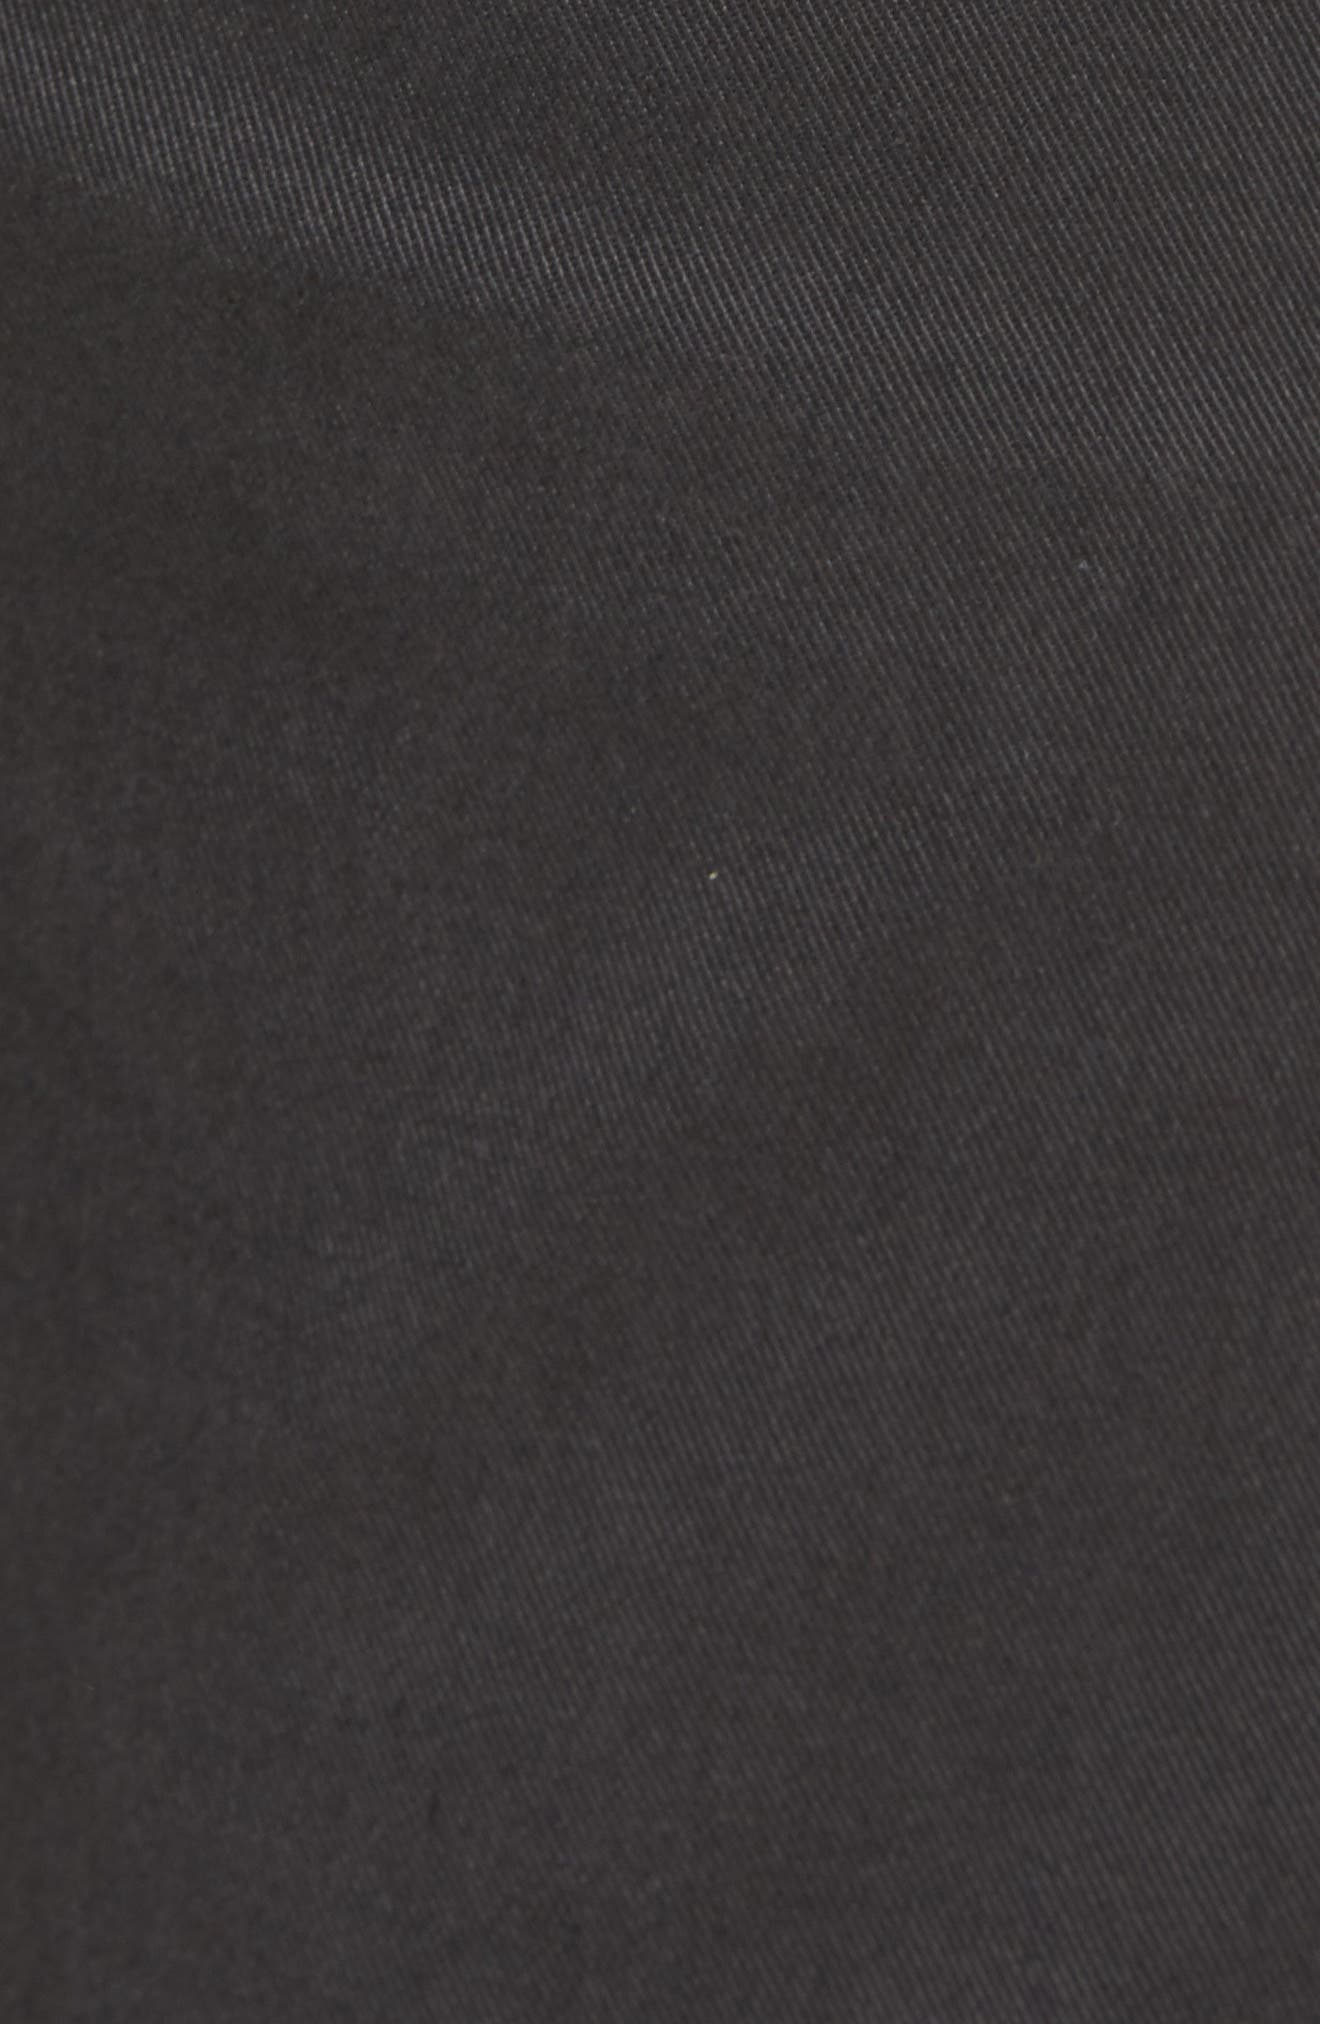 L'Homme Slim Fit Chino Pants,                             Alternate thumbnail 5, color,                             HEMATITE